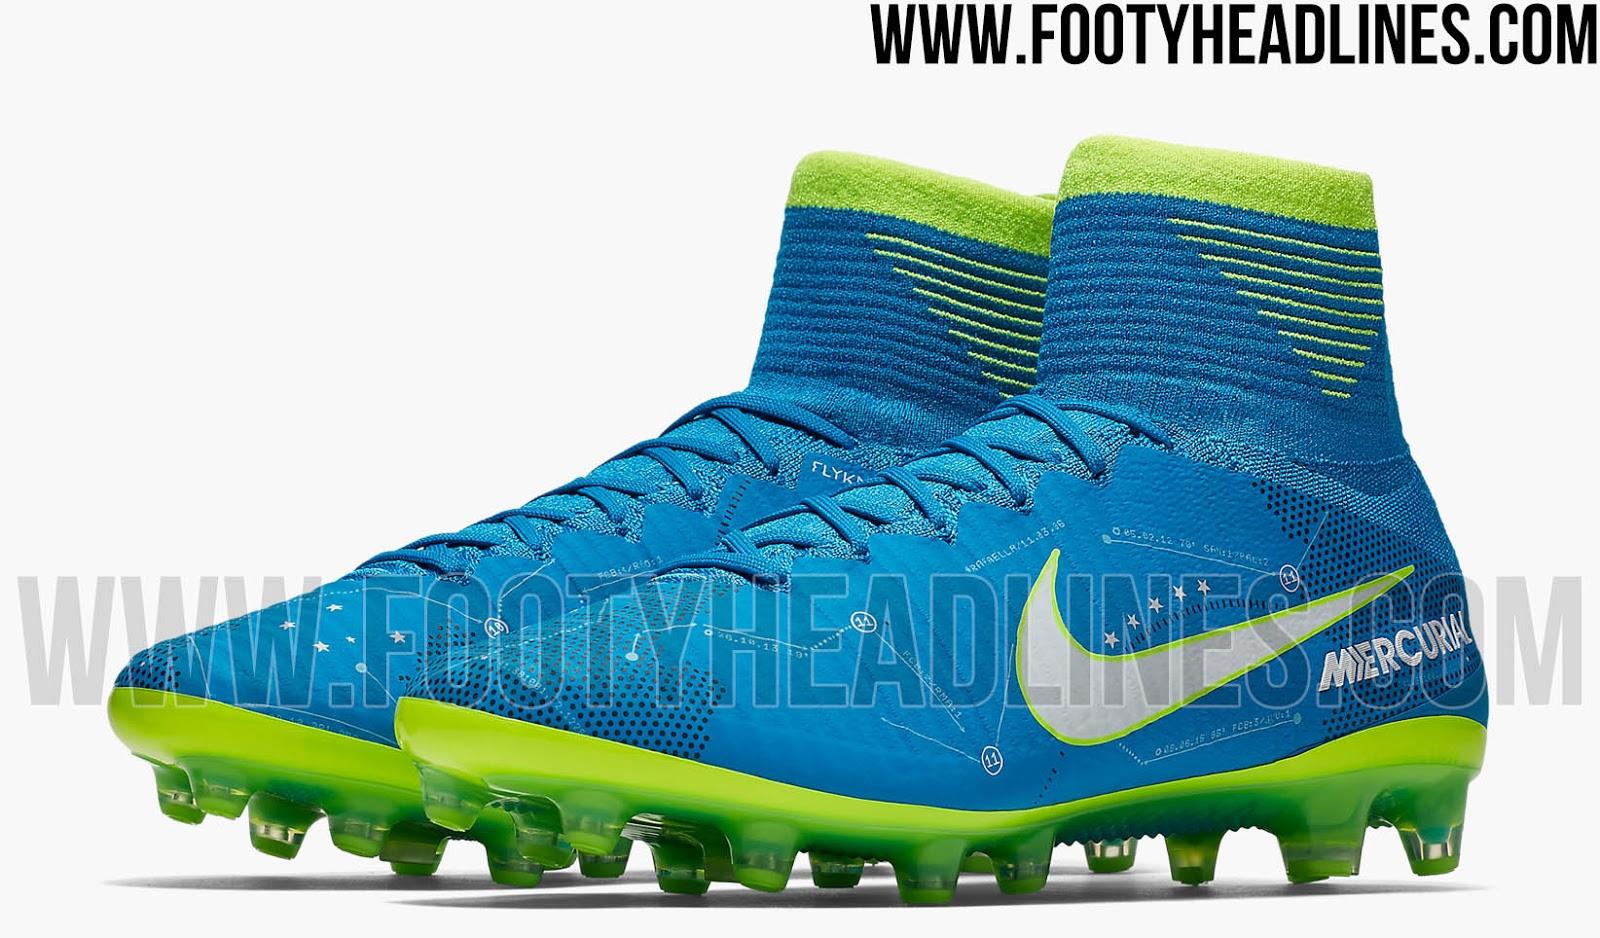 Neymar Jr Soccer Shoes New Life